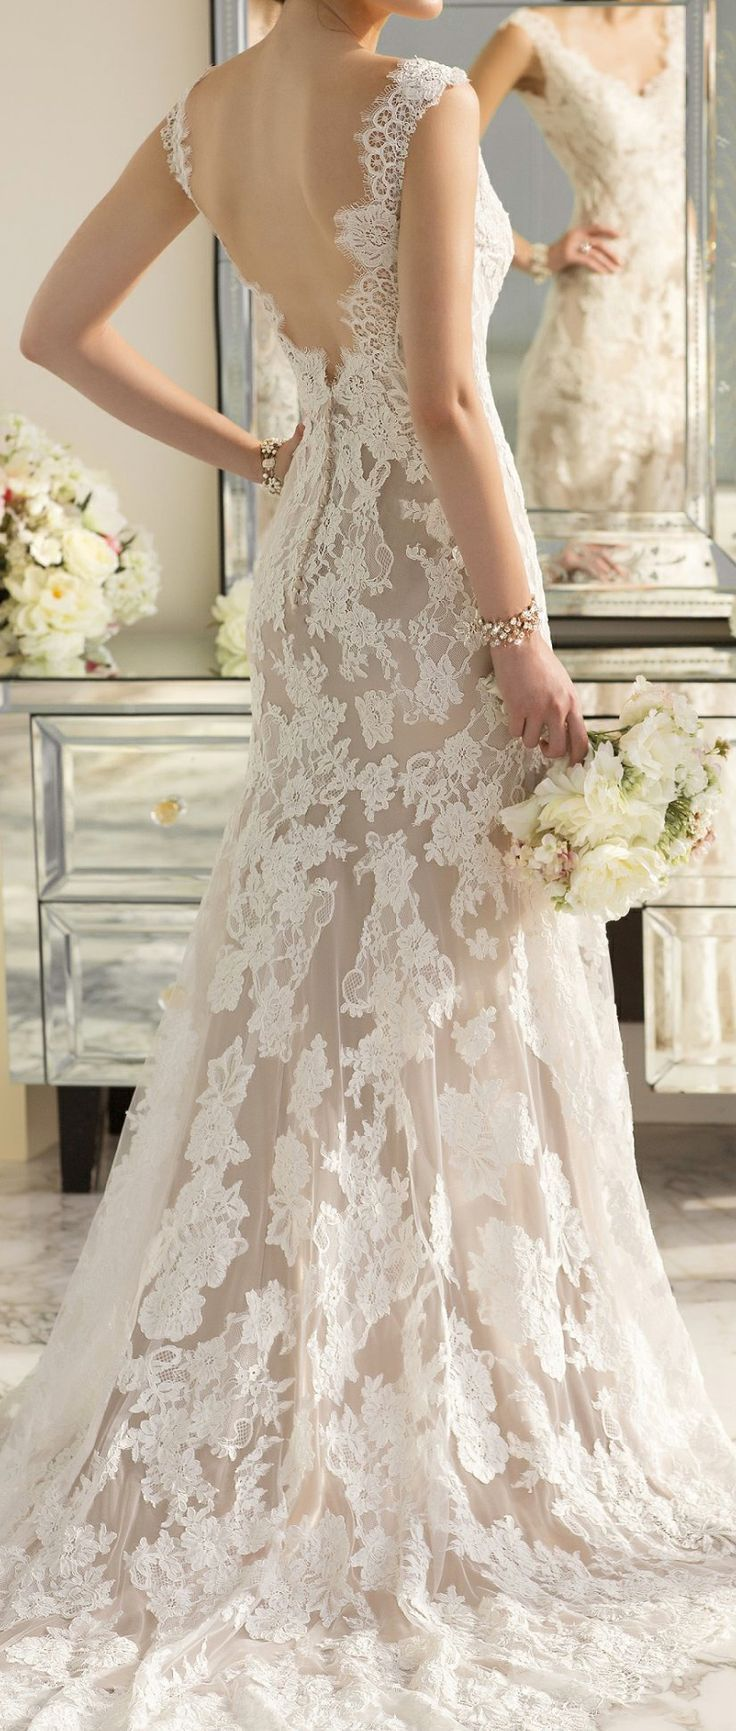 Lace wedding dresses vestidos pinterest lace wedding dresses